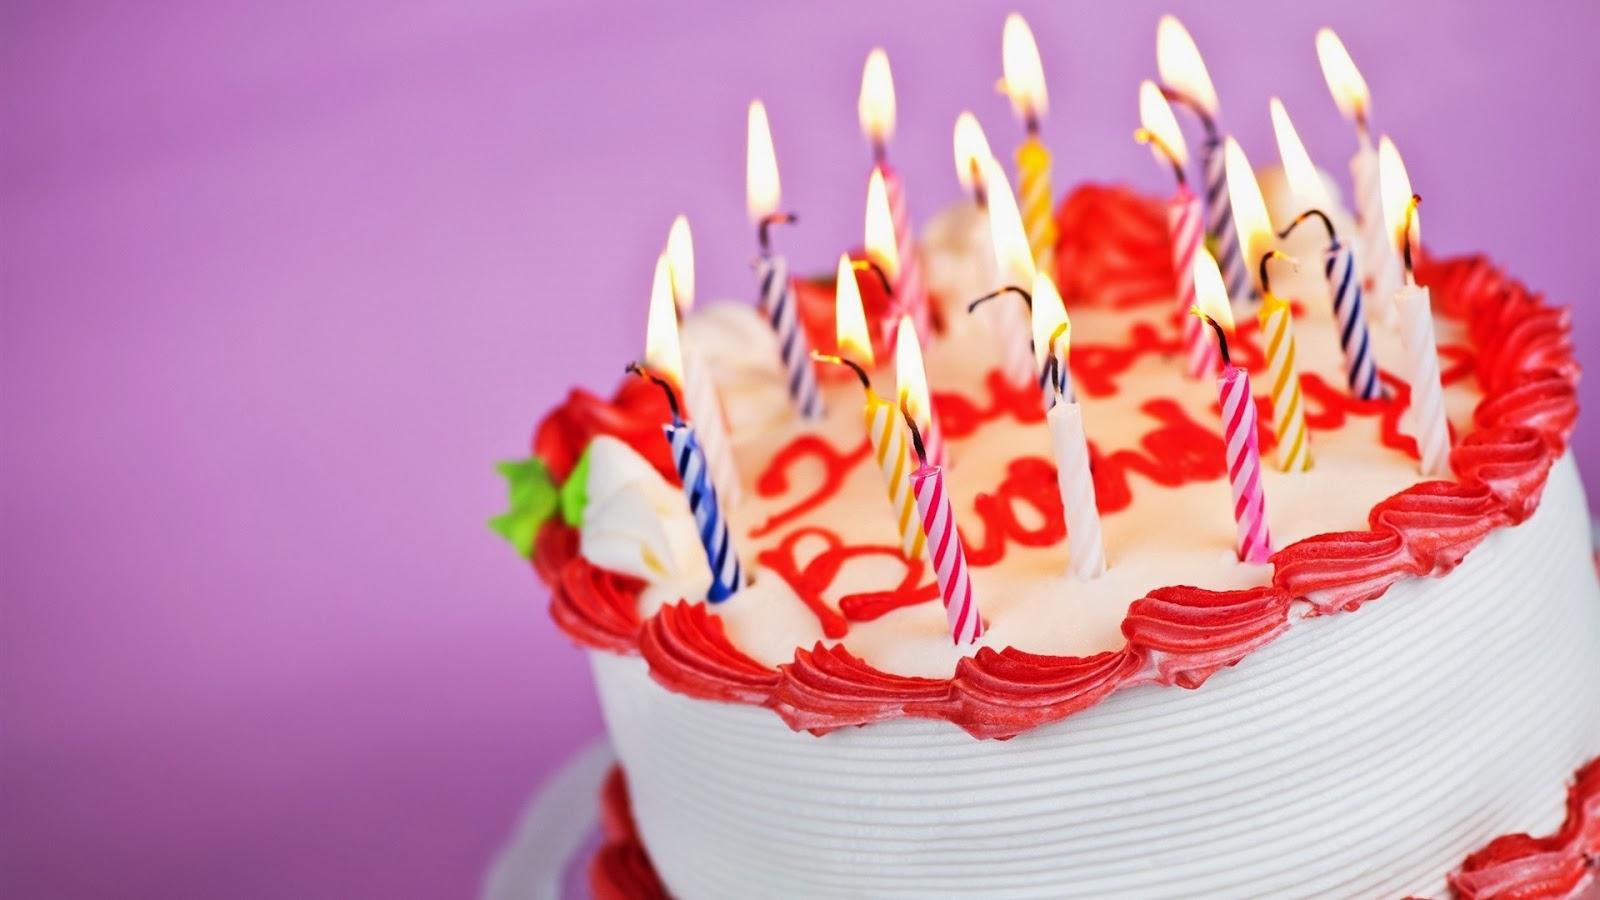 Enjoyable 36 Photofunia Birthday Cake Edit Birthday Photofunia Edit Cake Funny Birthday Cards Online Necthendildamsfinfo